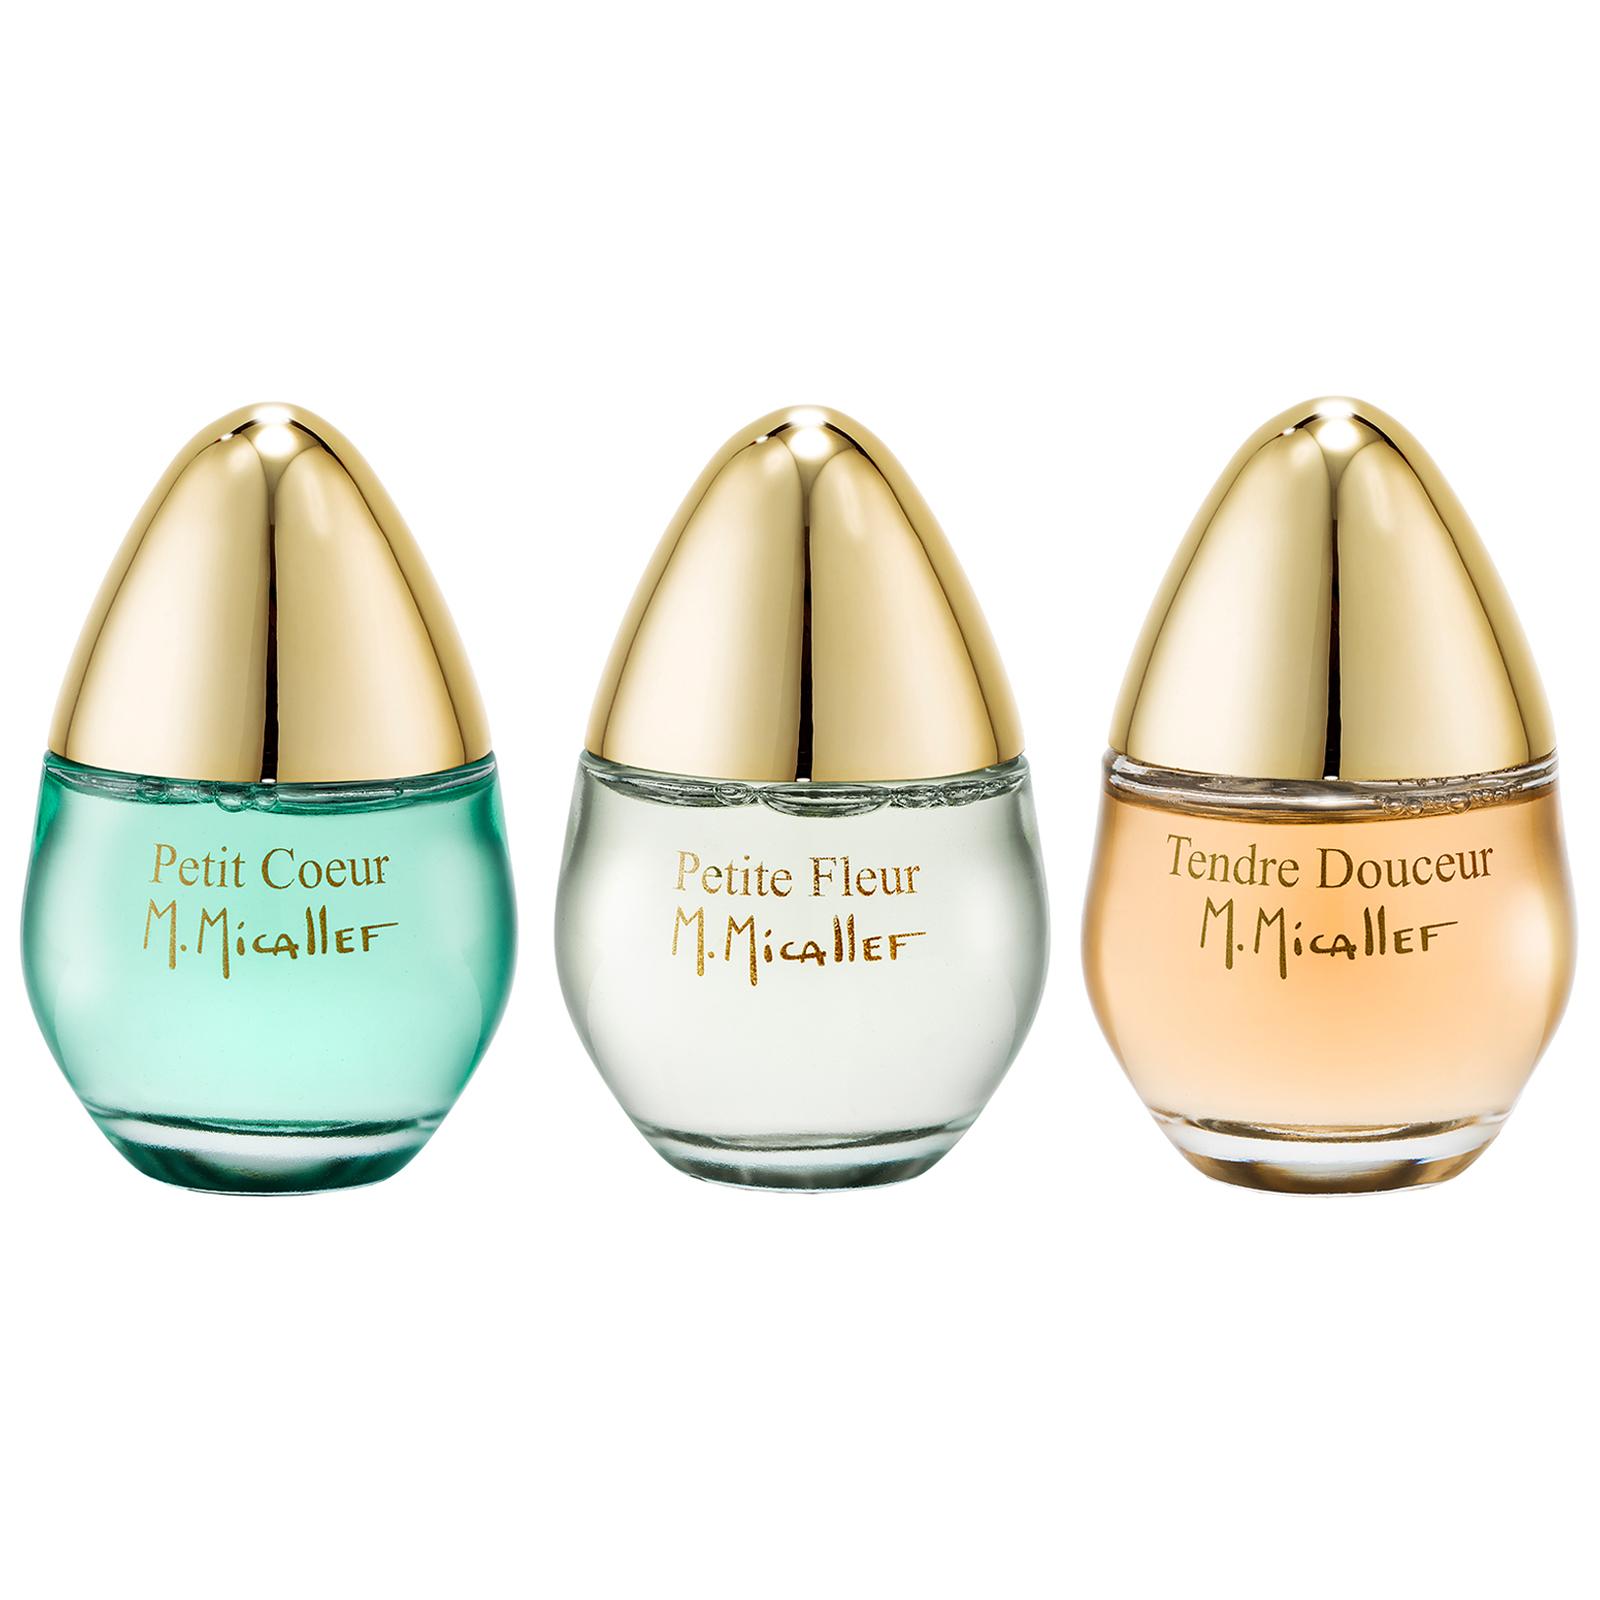 Coffret 3 x 30ml perfume eau de parfum 30 ml